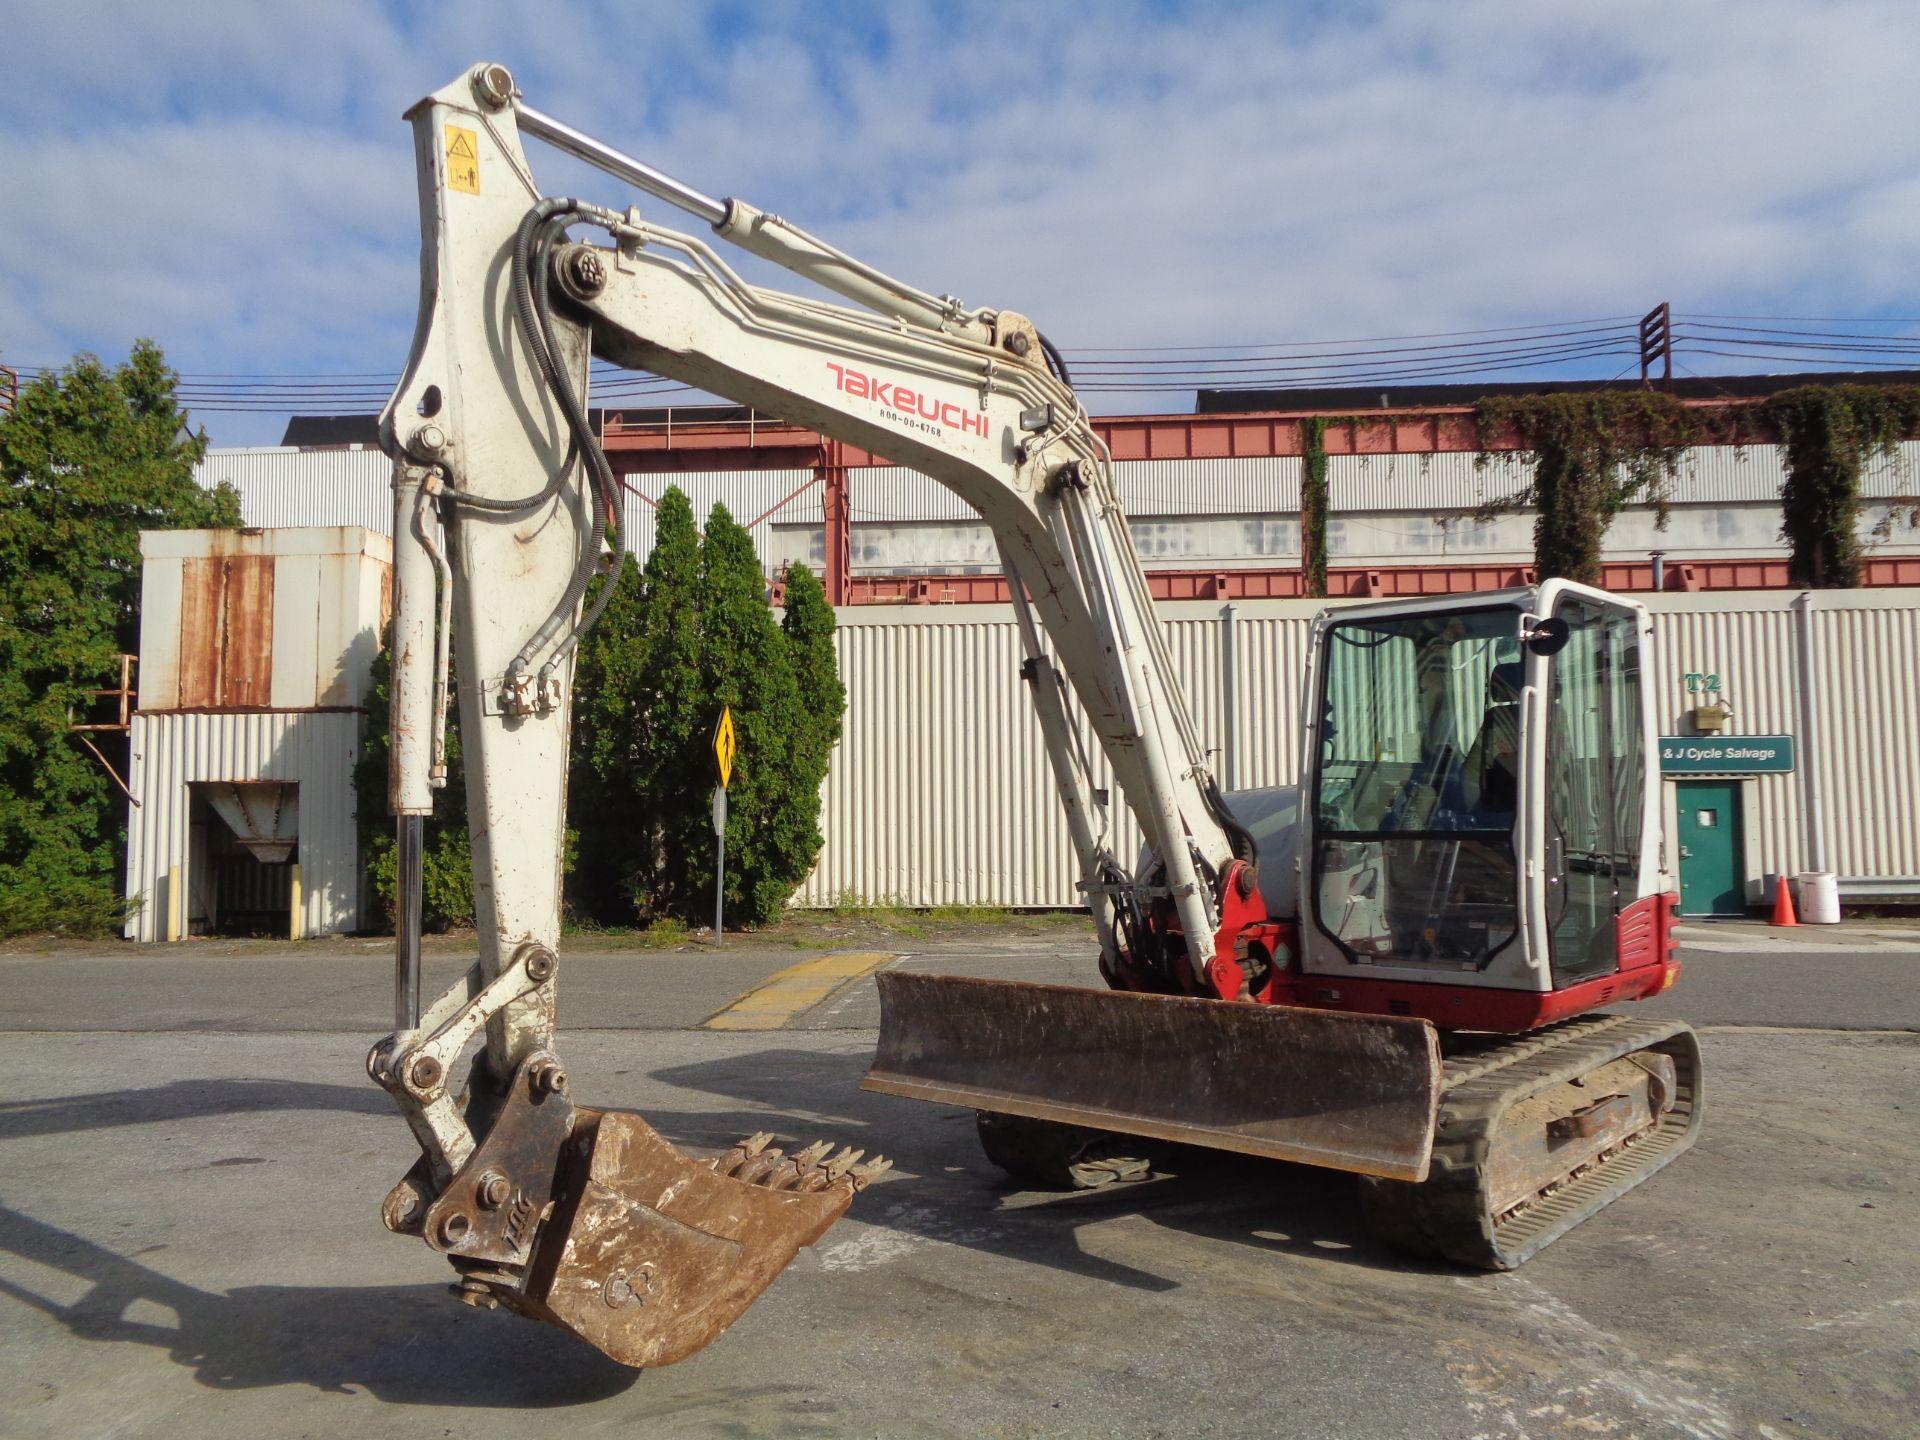 Lot 36 - 2014 Takeuchi TB285 Excavator